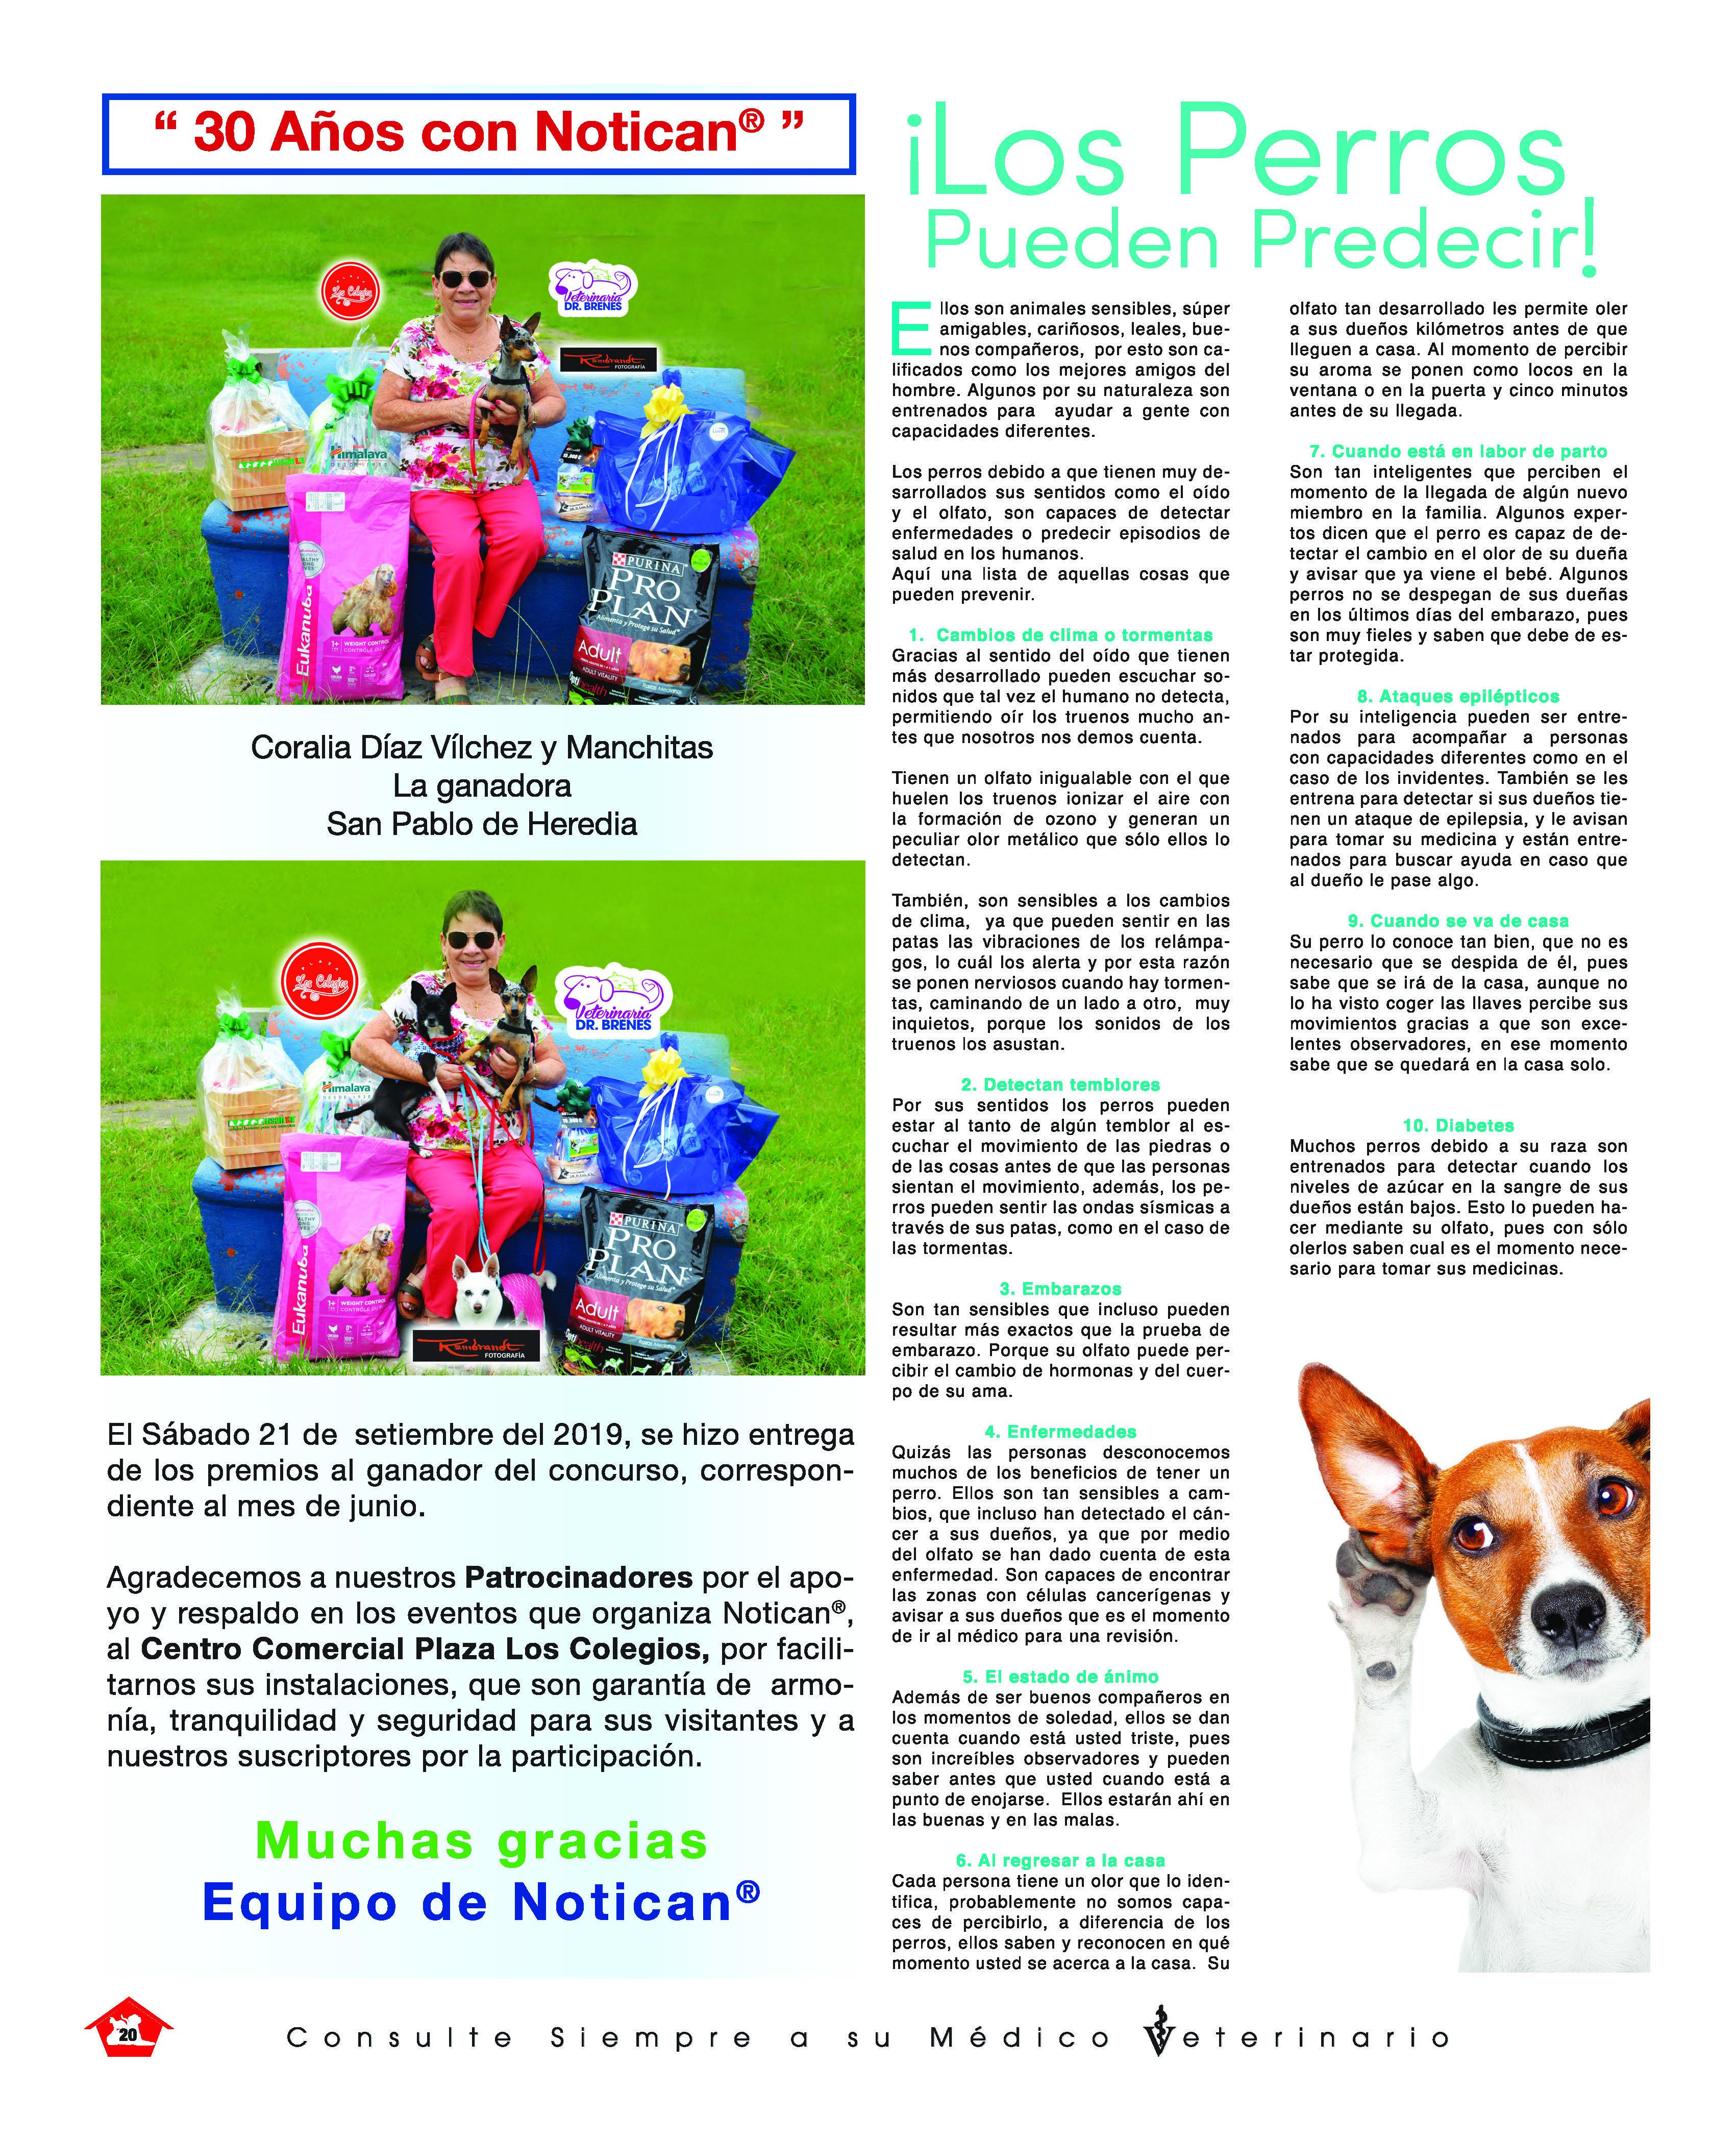 http://www.notican.com/wp-content/uploads/2019/10/Notican-Setiembre-2019-copy_Página_20.jpg